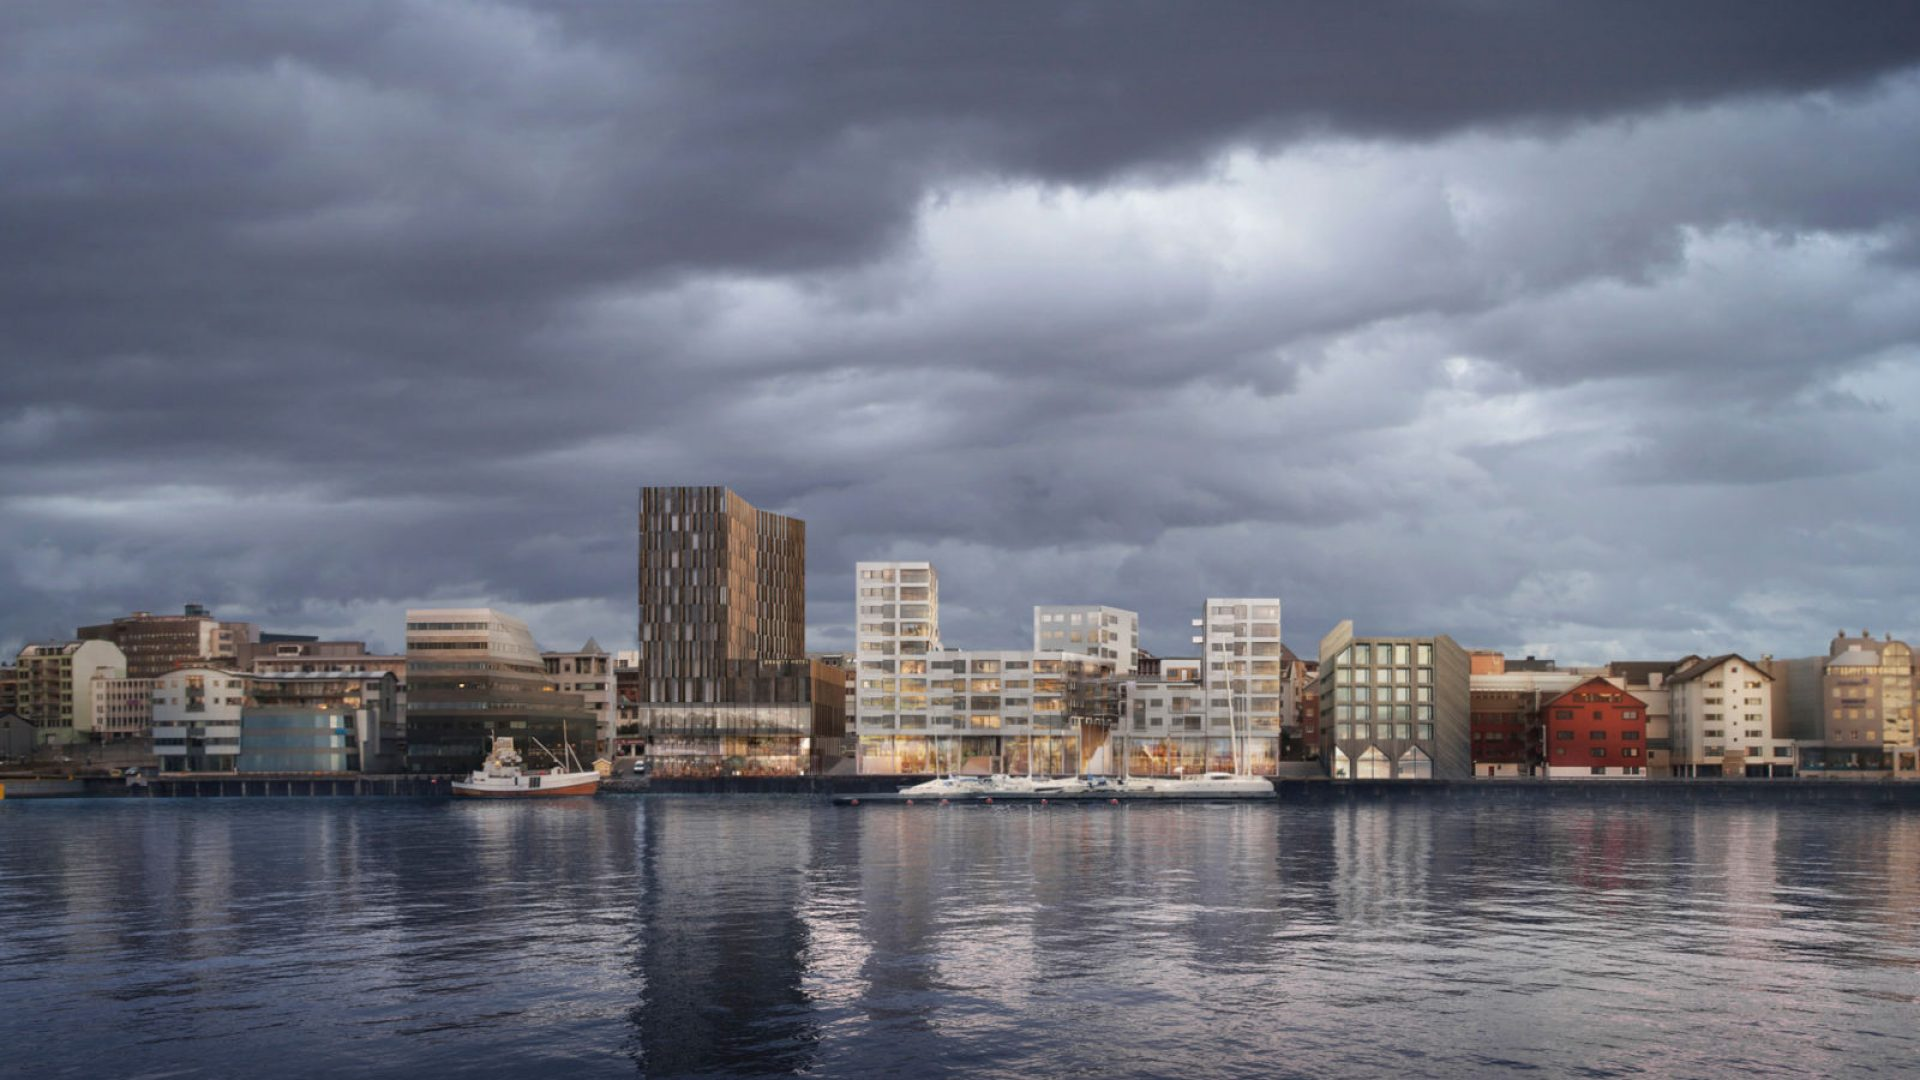 40008_Quality_Hotell_Bod_Nordic_Brick_Visual_N5_devsize_8dc26ff132f44ce96291c13c61855fa4